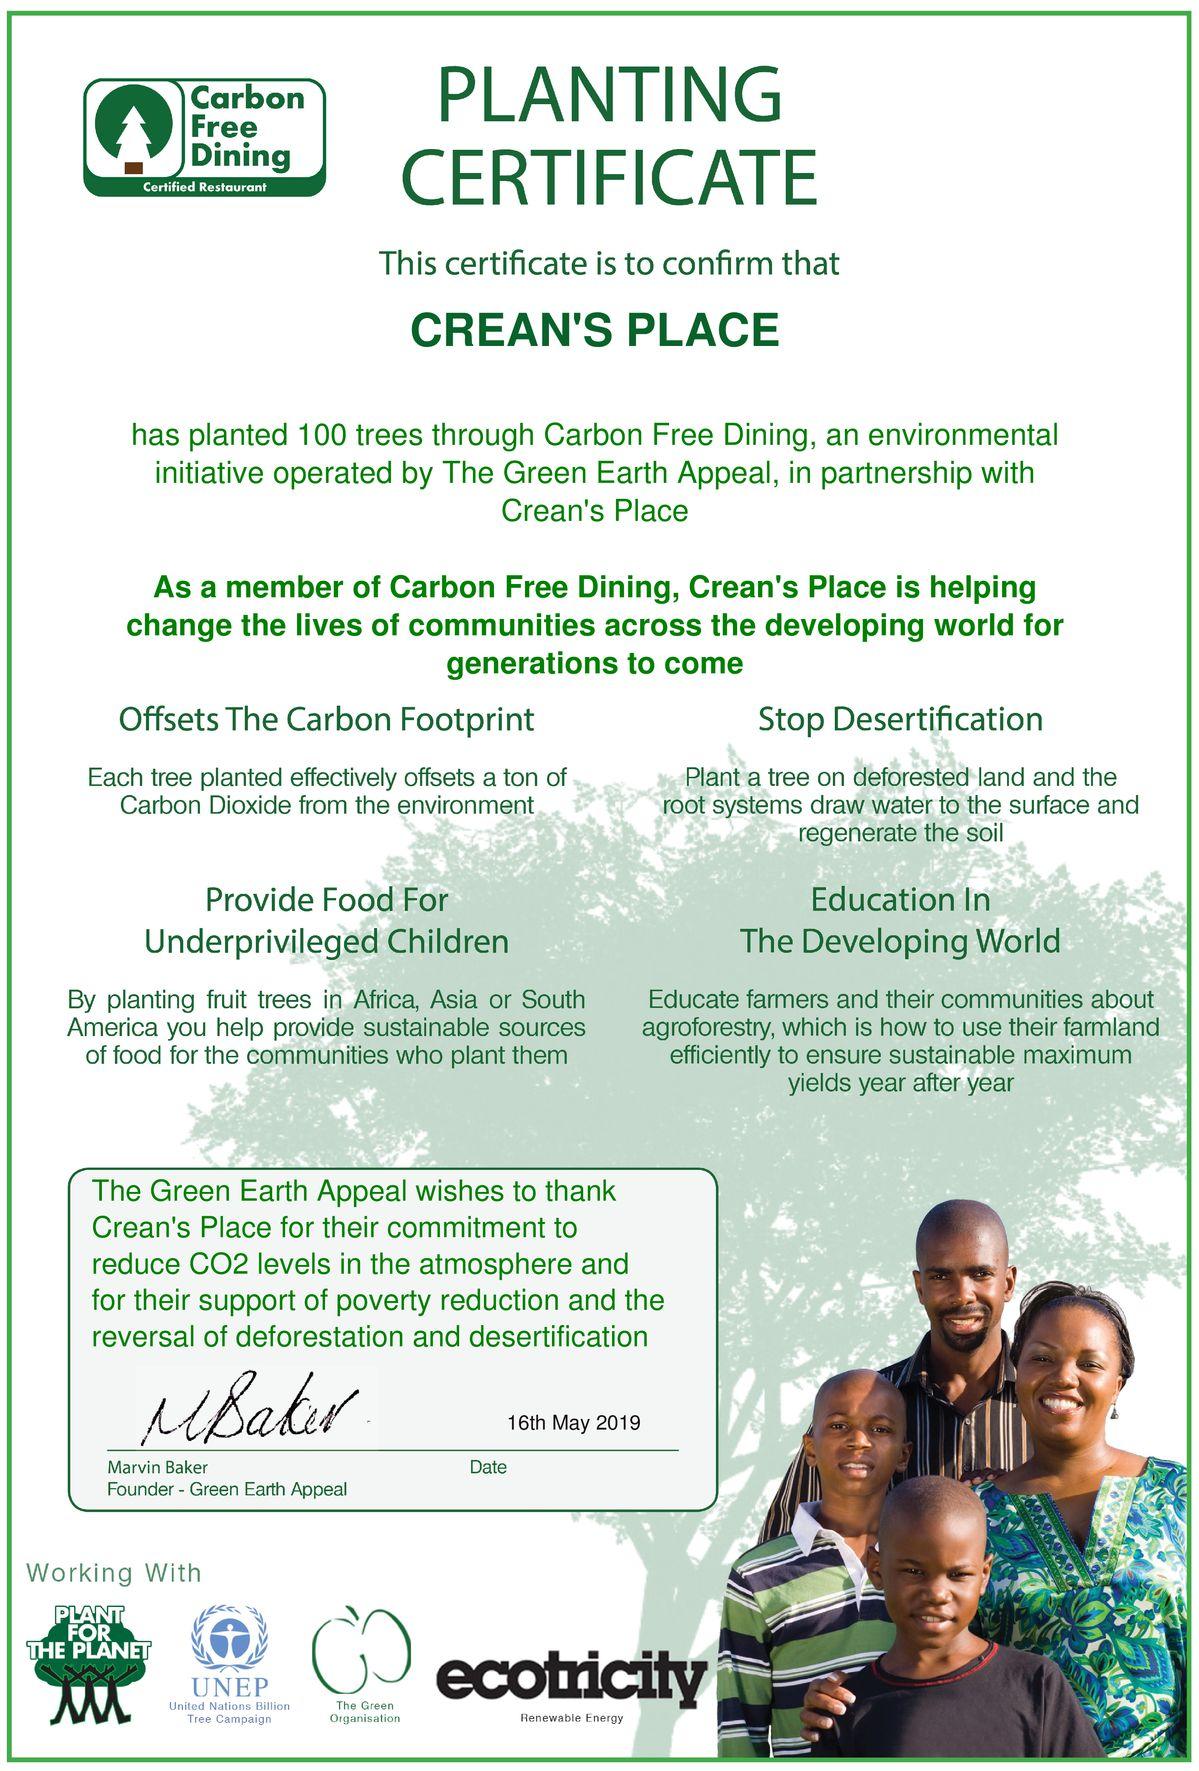 Crean's Place